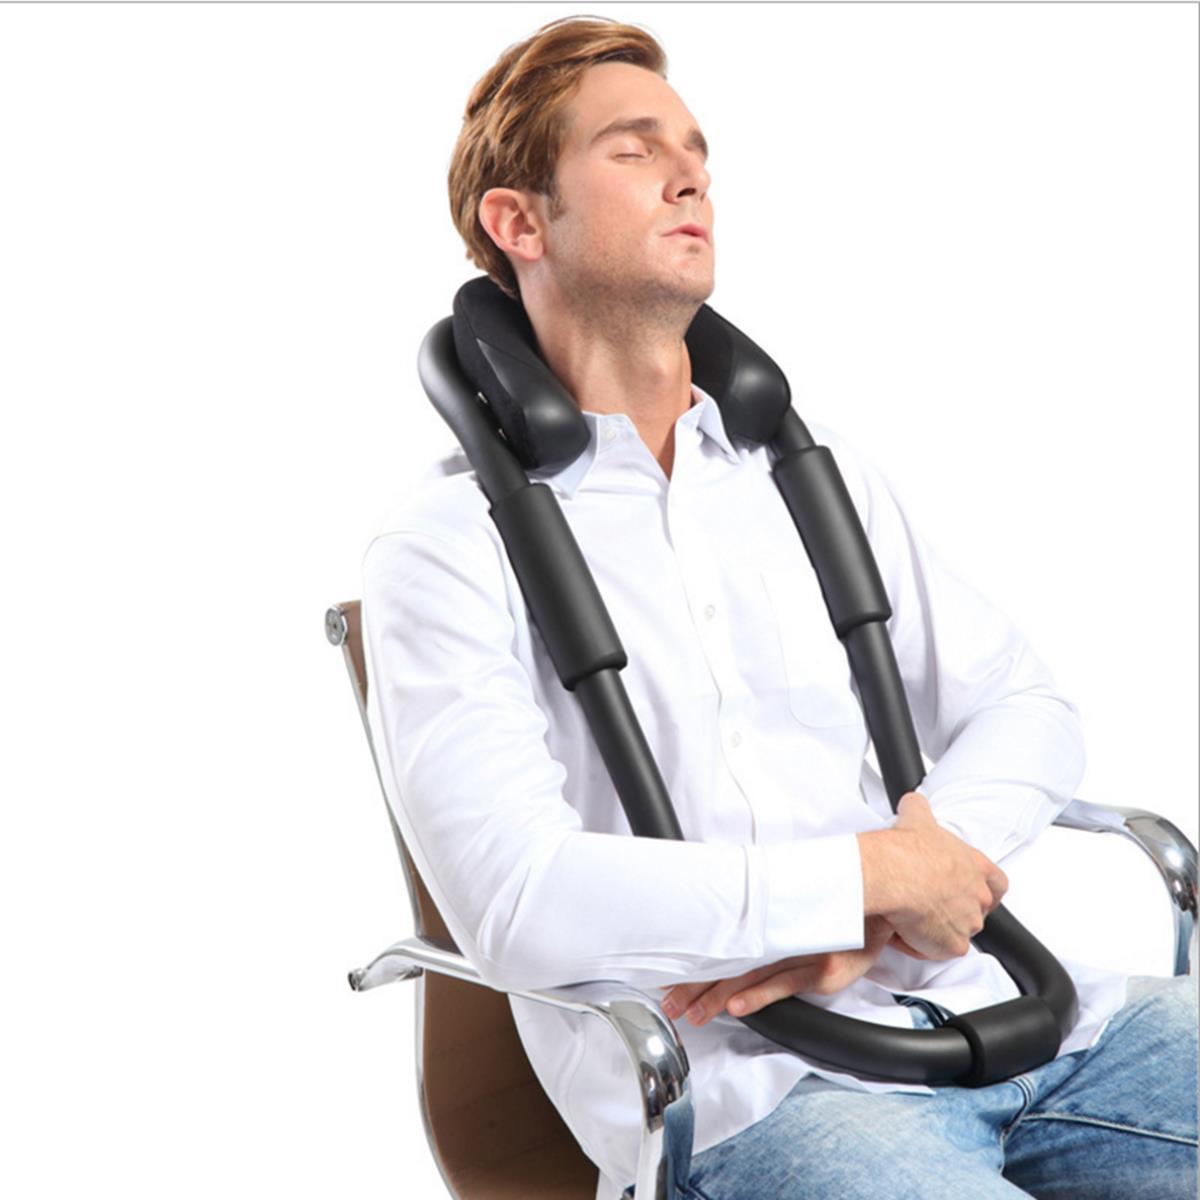 Neck U Shaped Cervical Pillow Office Nap Aircraft Car Travel Black Hardcover